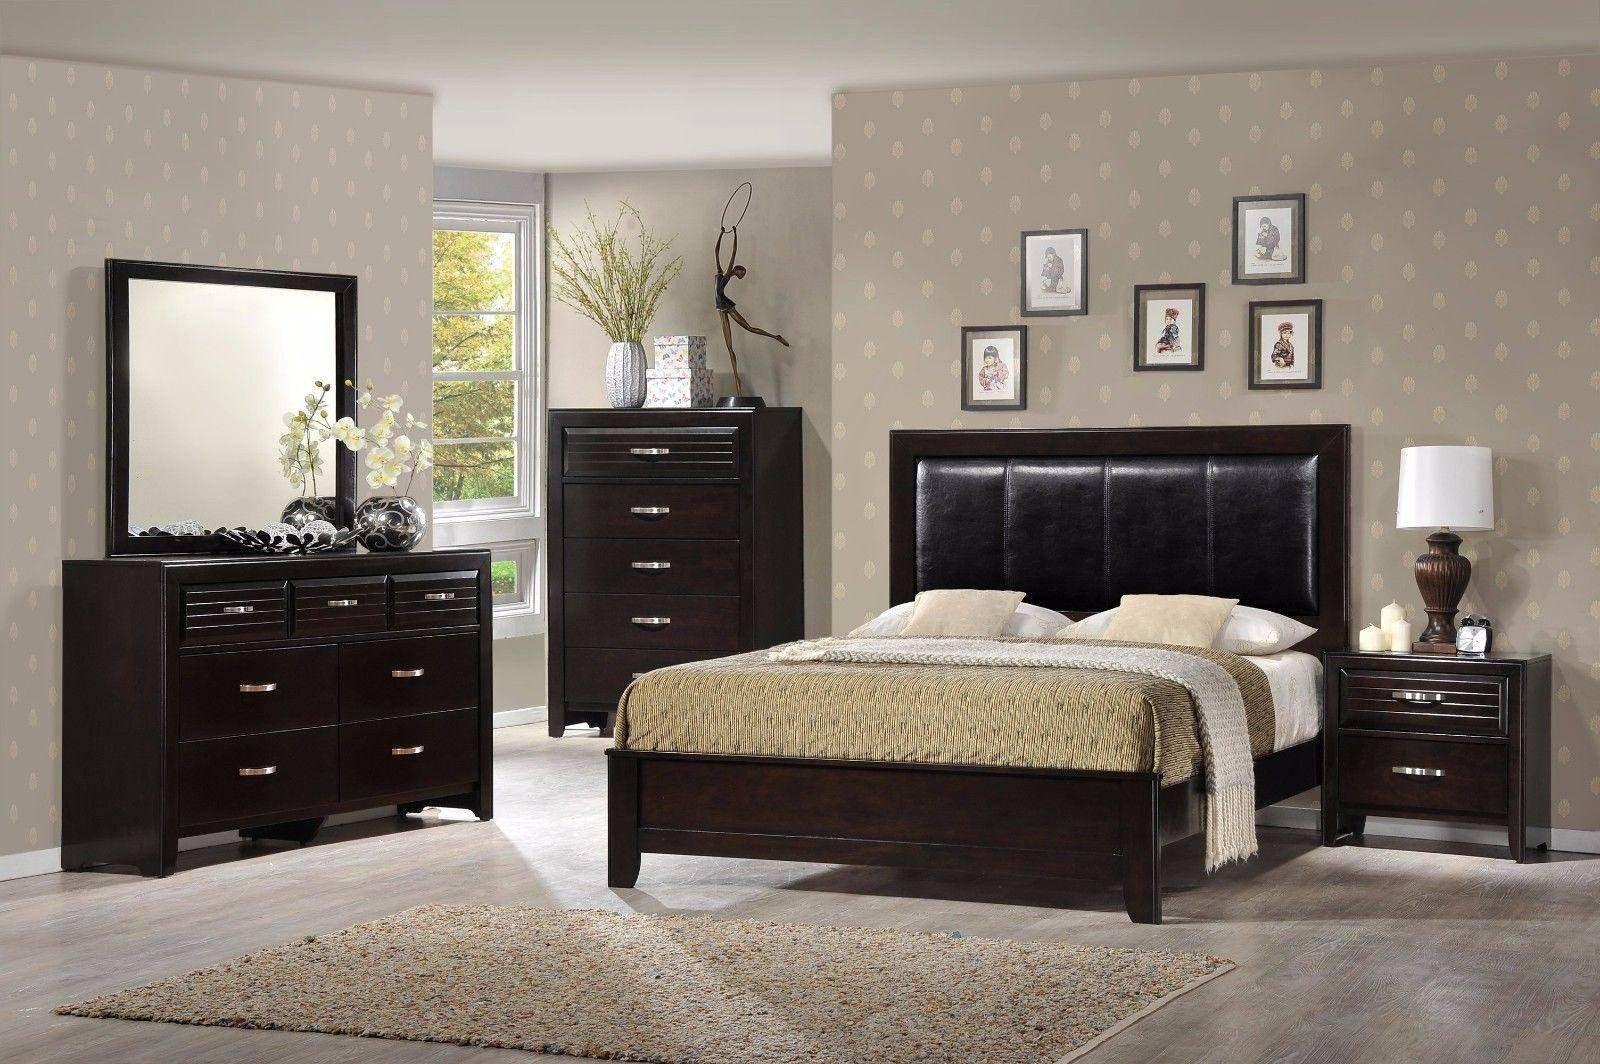 Espresso King Bedroom Set Unique Crown Mark B7400 Jocelyn Dark Espresso solid Wood King Size Bedroom Set 3pcs